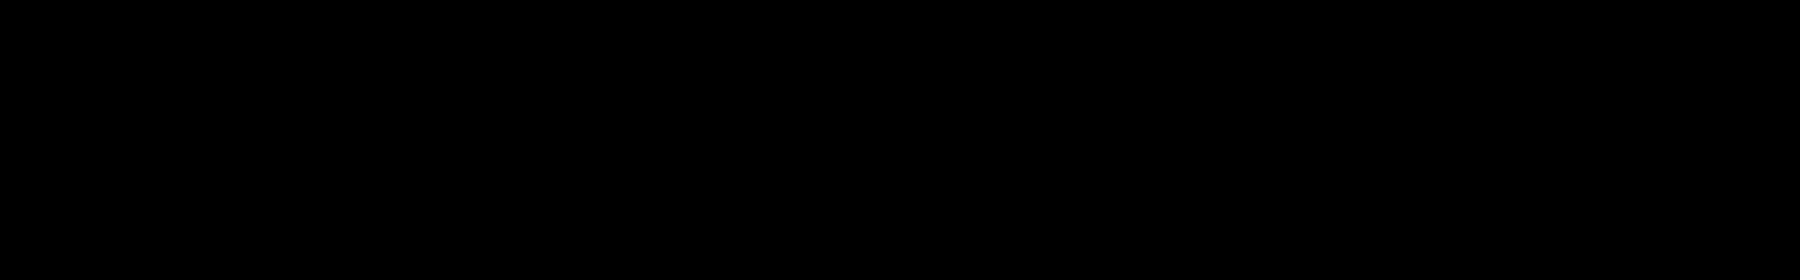 Torii 3 - Lofi Beats audio waveform